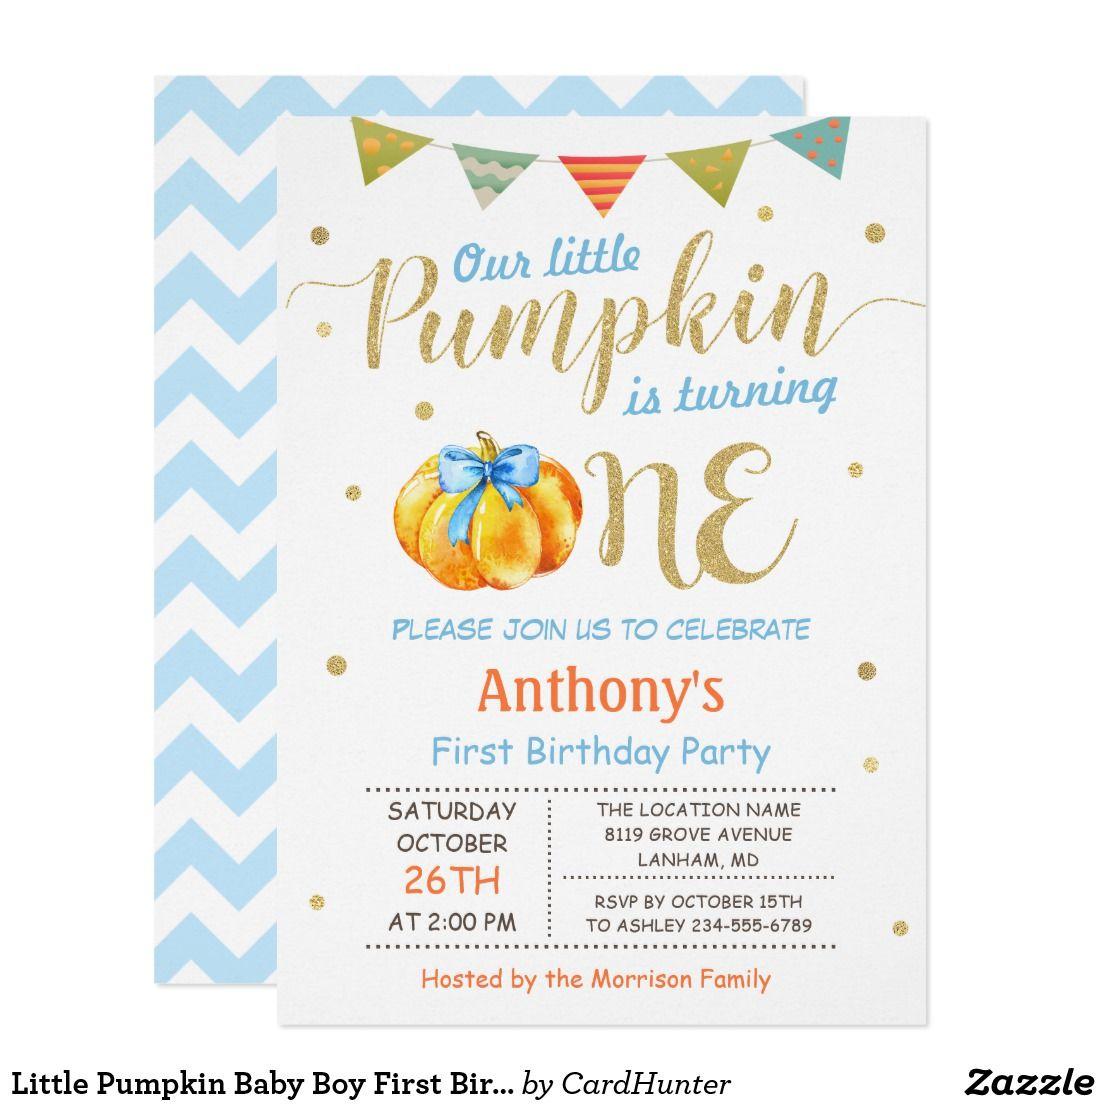 Little Pumpkin Baby Boy First Birthday Party Invitation | Fall ...